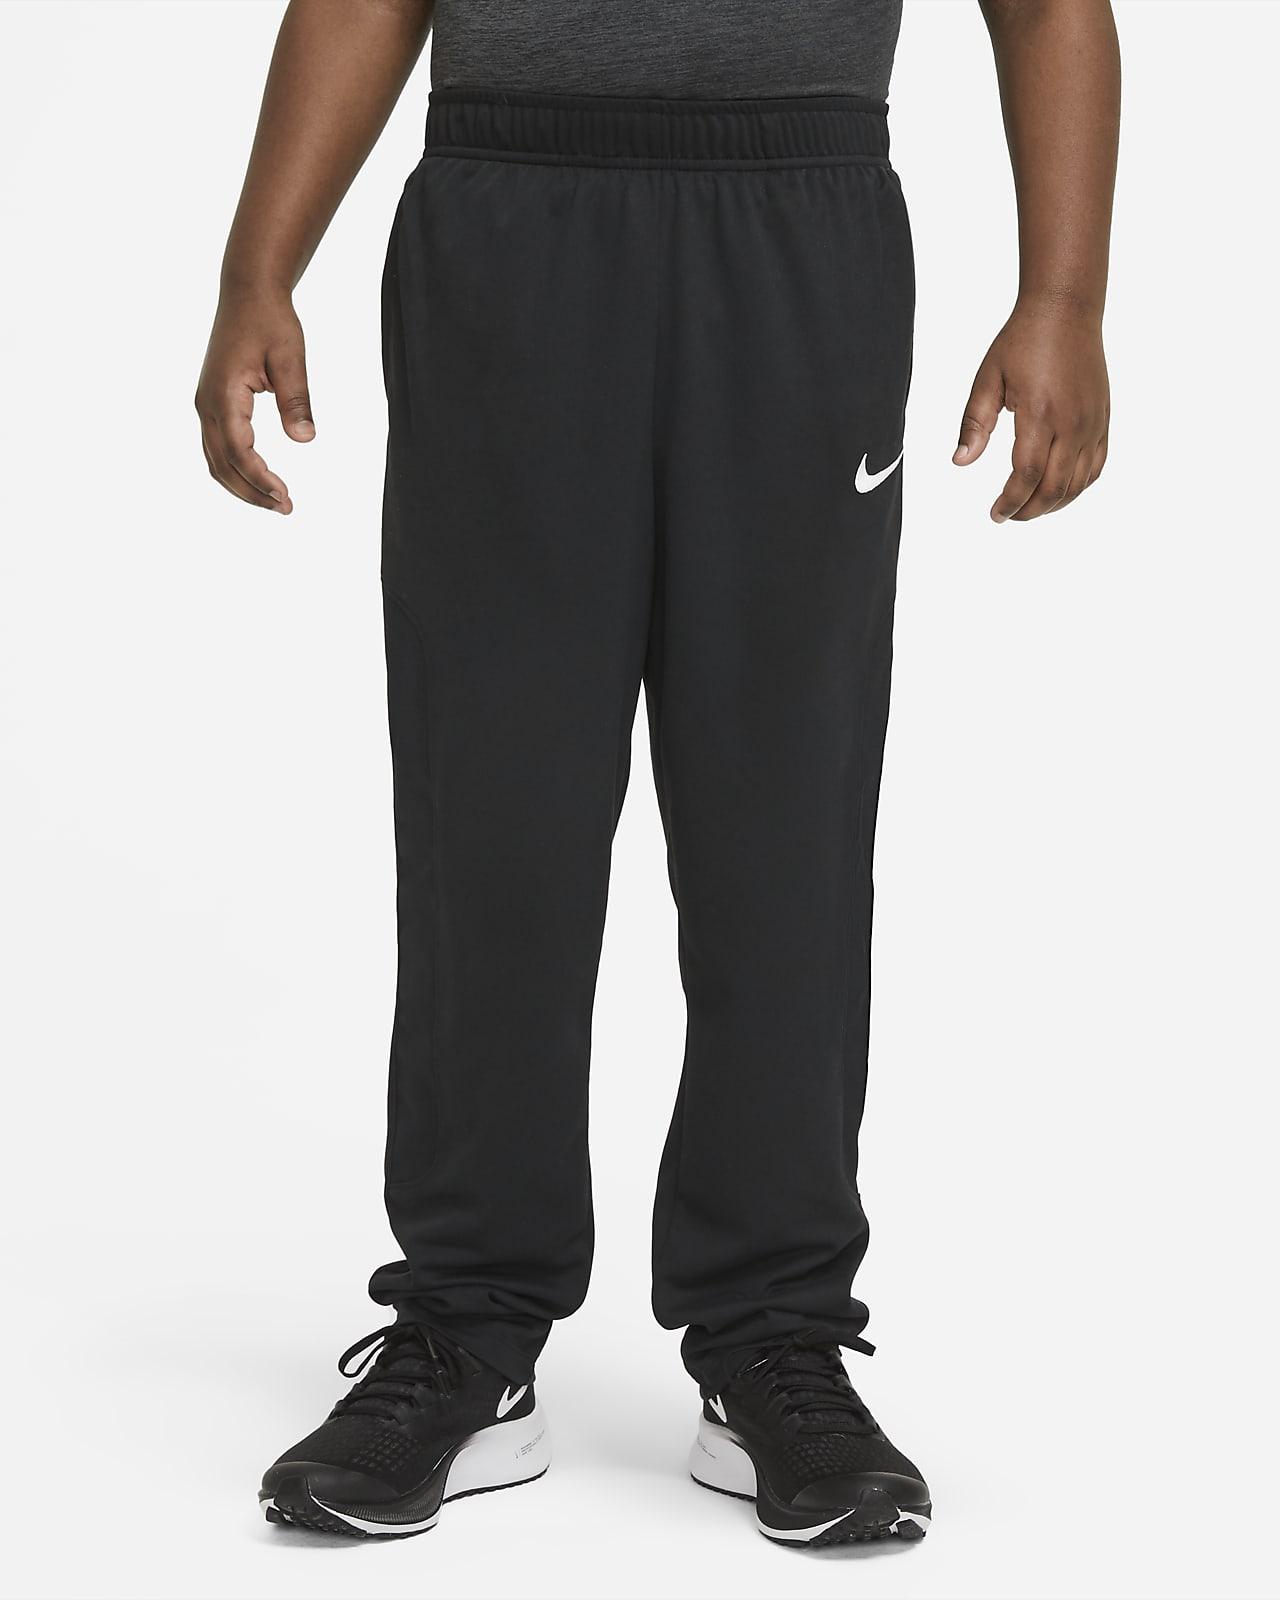 Nike Sport Big Kids' (Boys') Training Pants (Extended Size)